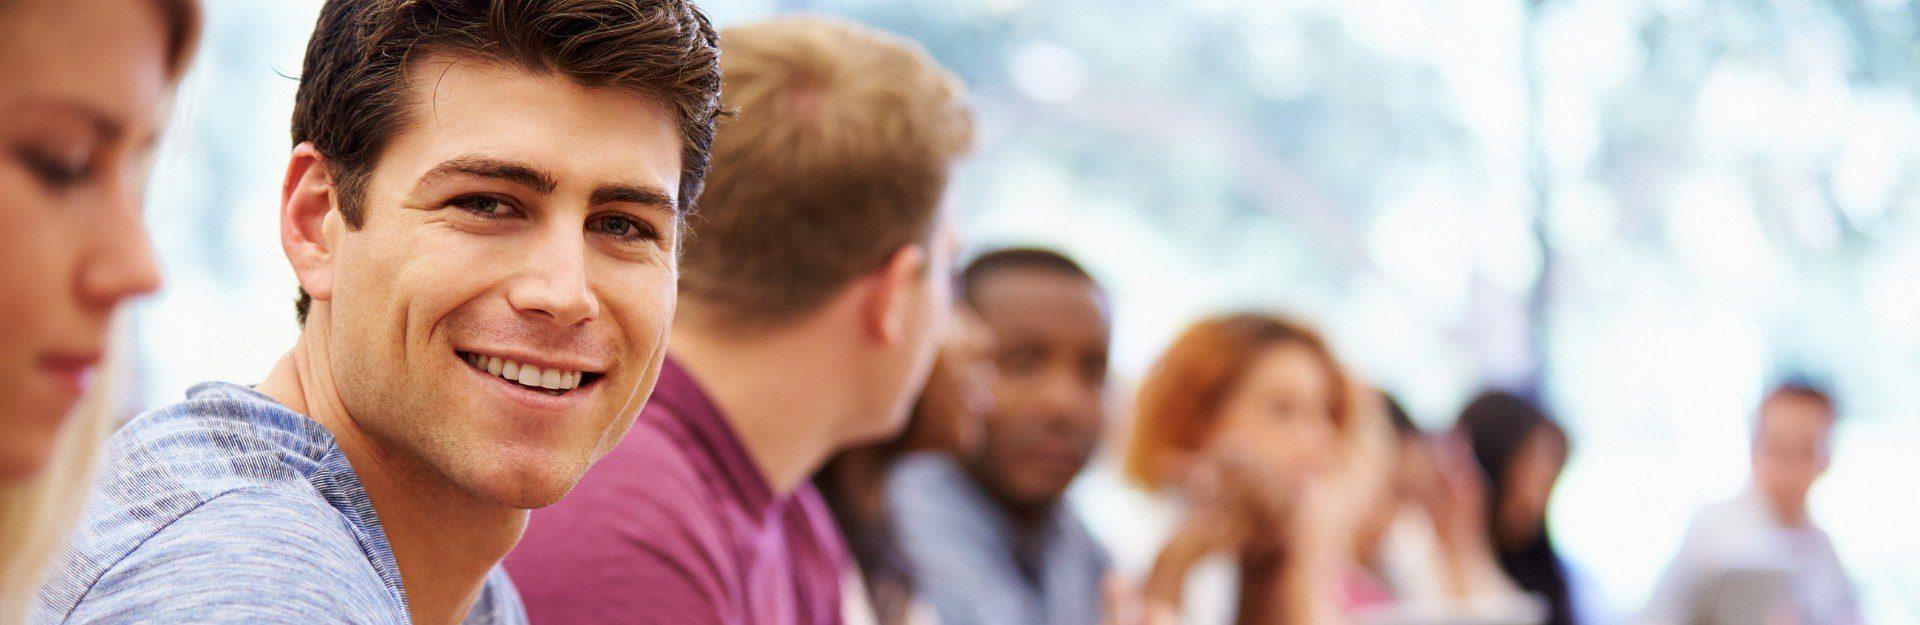 Bachelorstudiengang Arbeitsgestaltung und HR Management, FH des BFI Wien